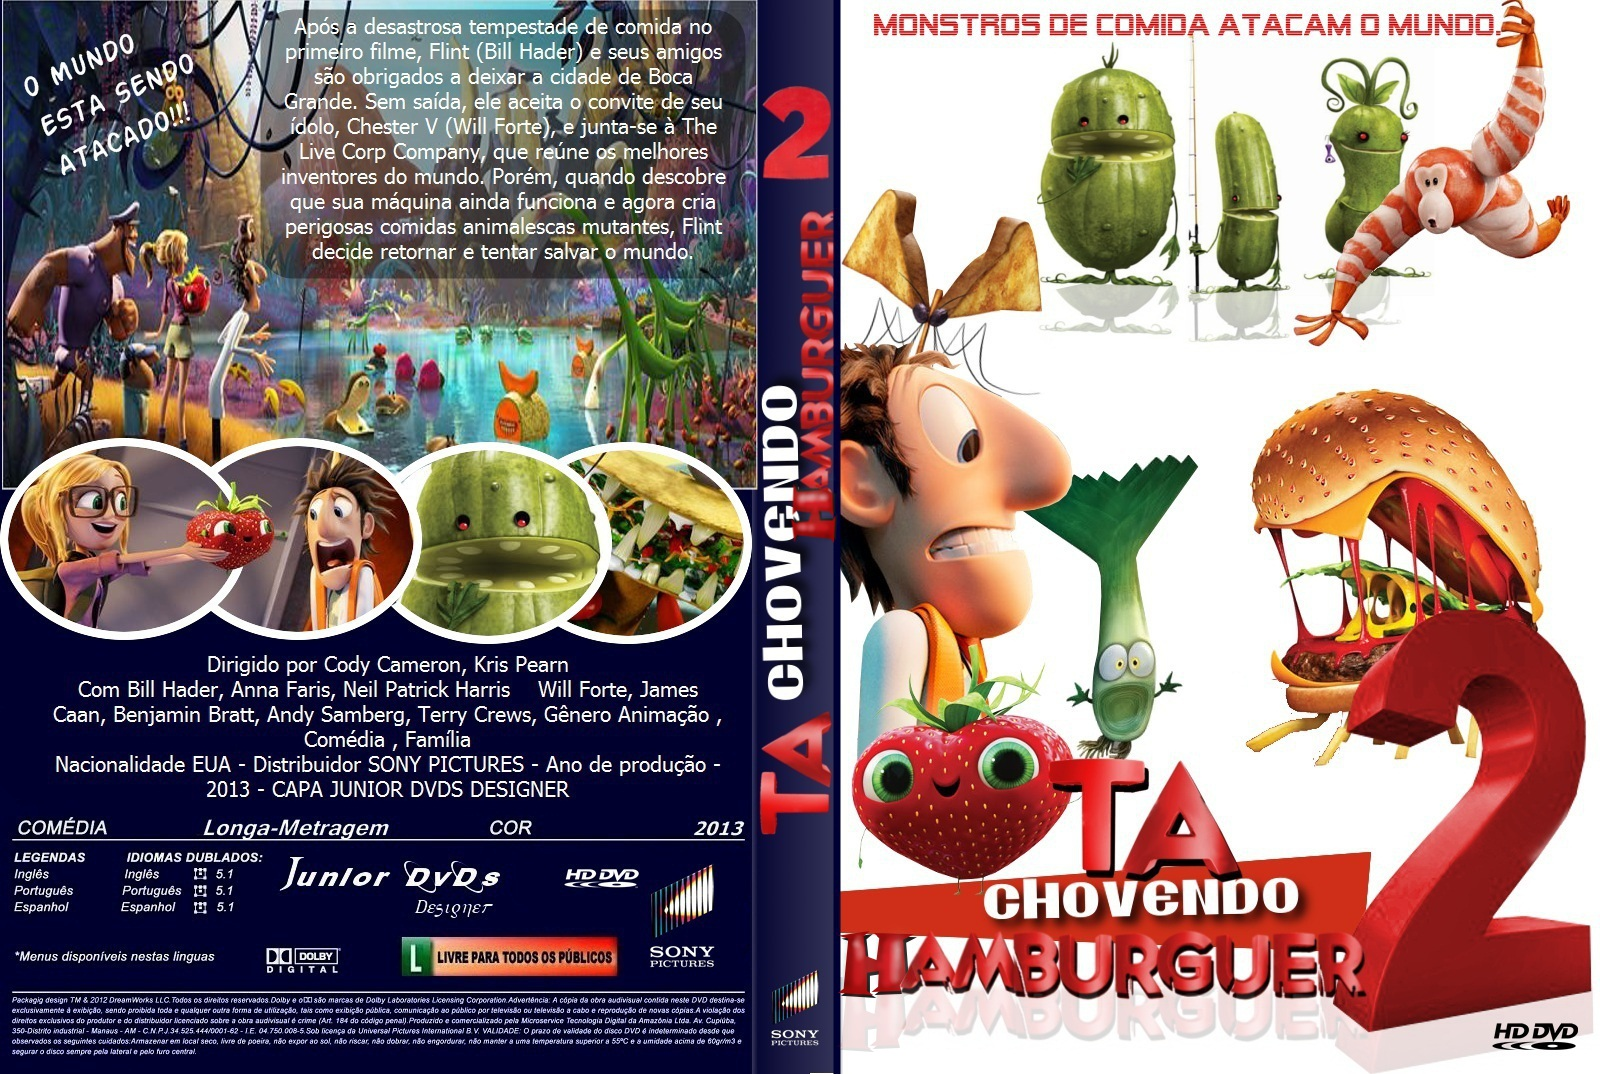 Filme Ta Chovendo Hamburguer Dublado Completo regarding baixar dvd-r tá chovendo hambúrguer 2 dvd-r